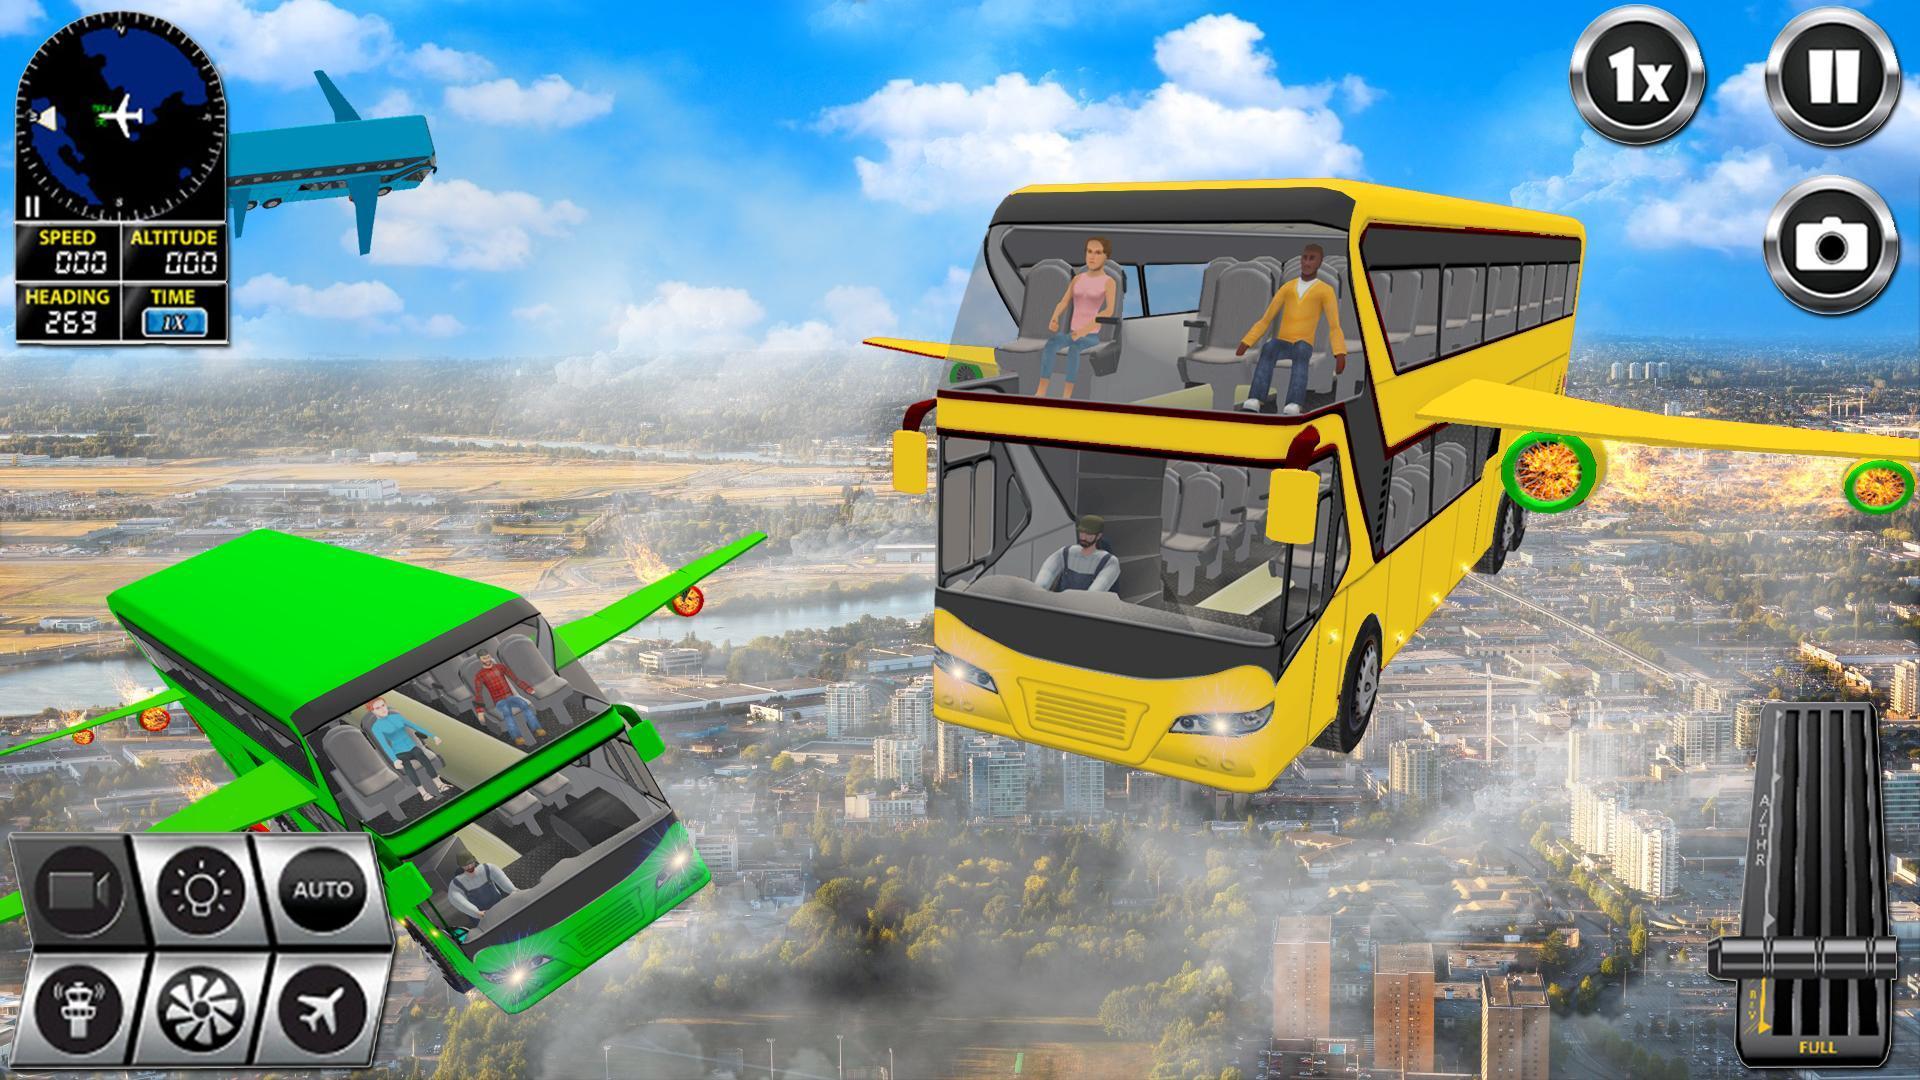 Flying Bus Driving simulator 2019: Free Bus Games 2.8 Screenshot 15